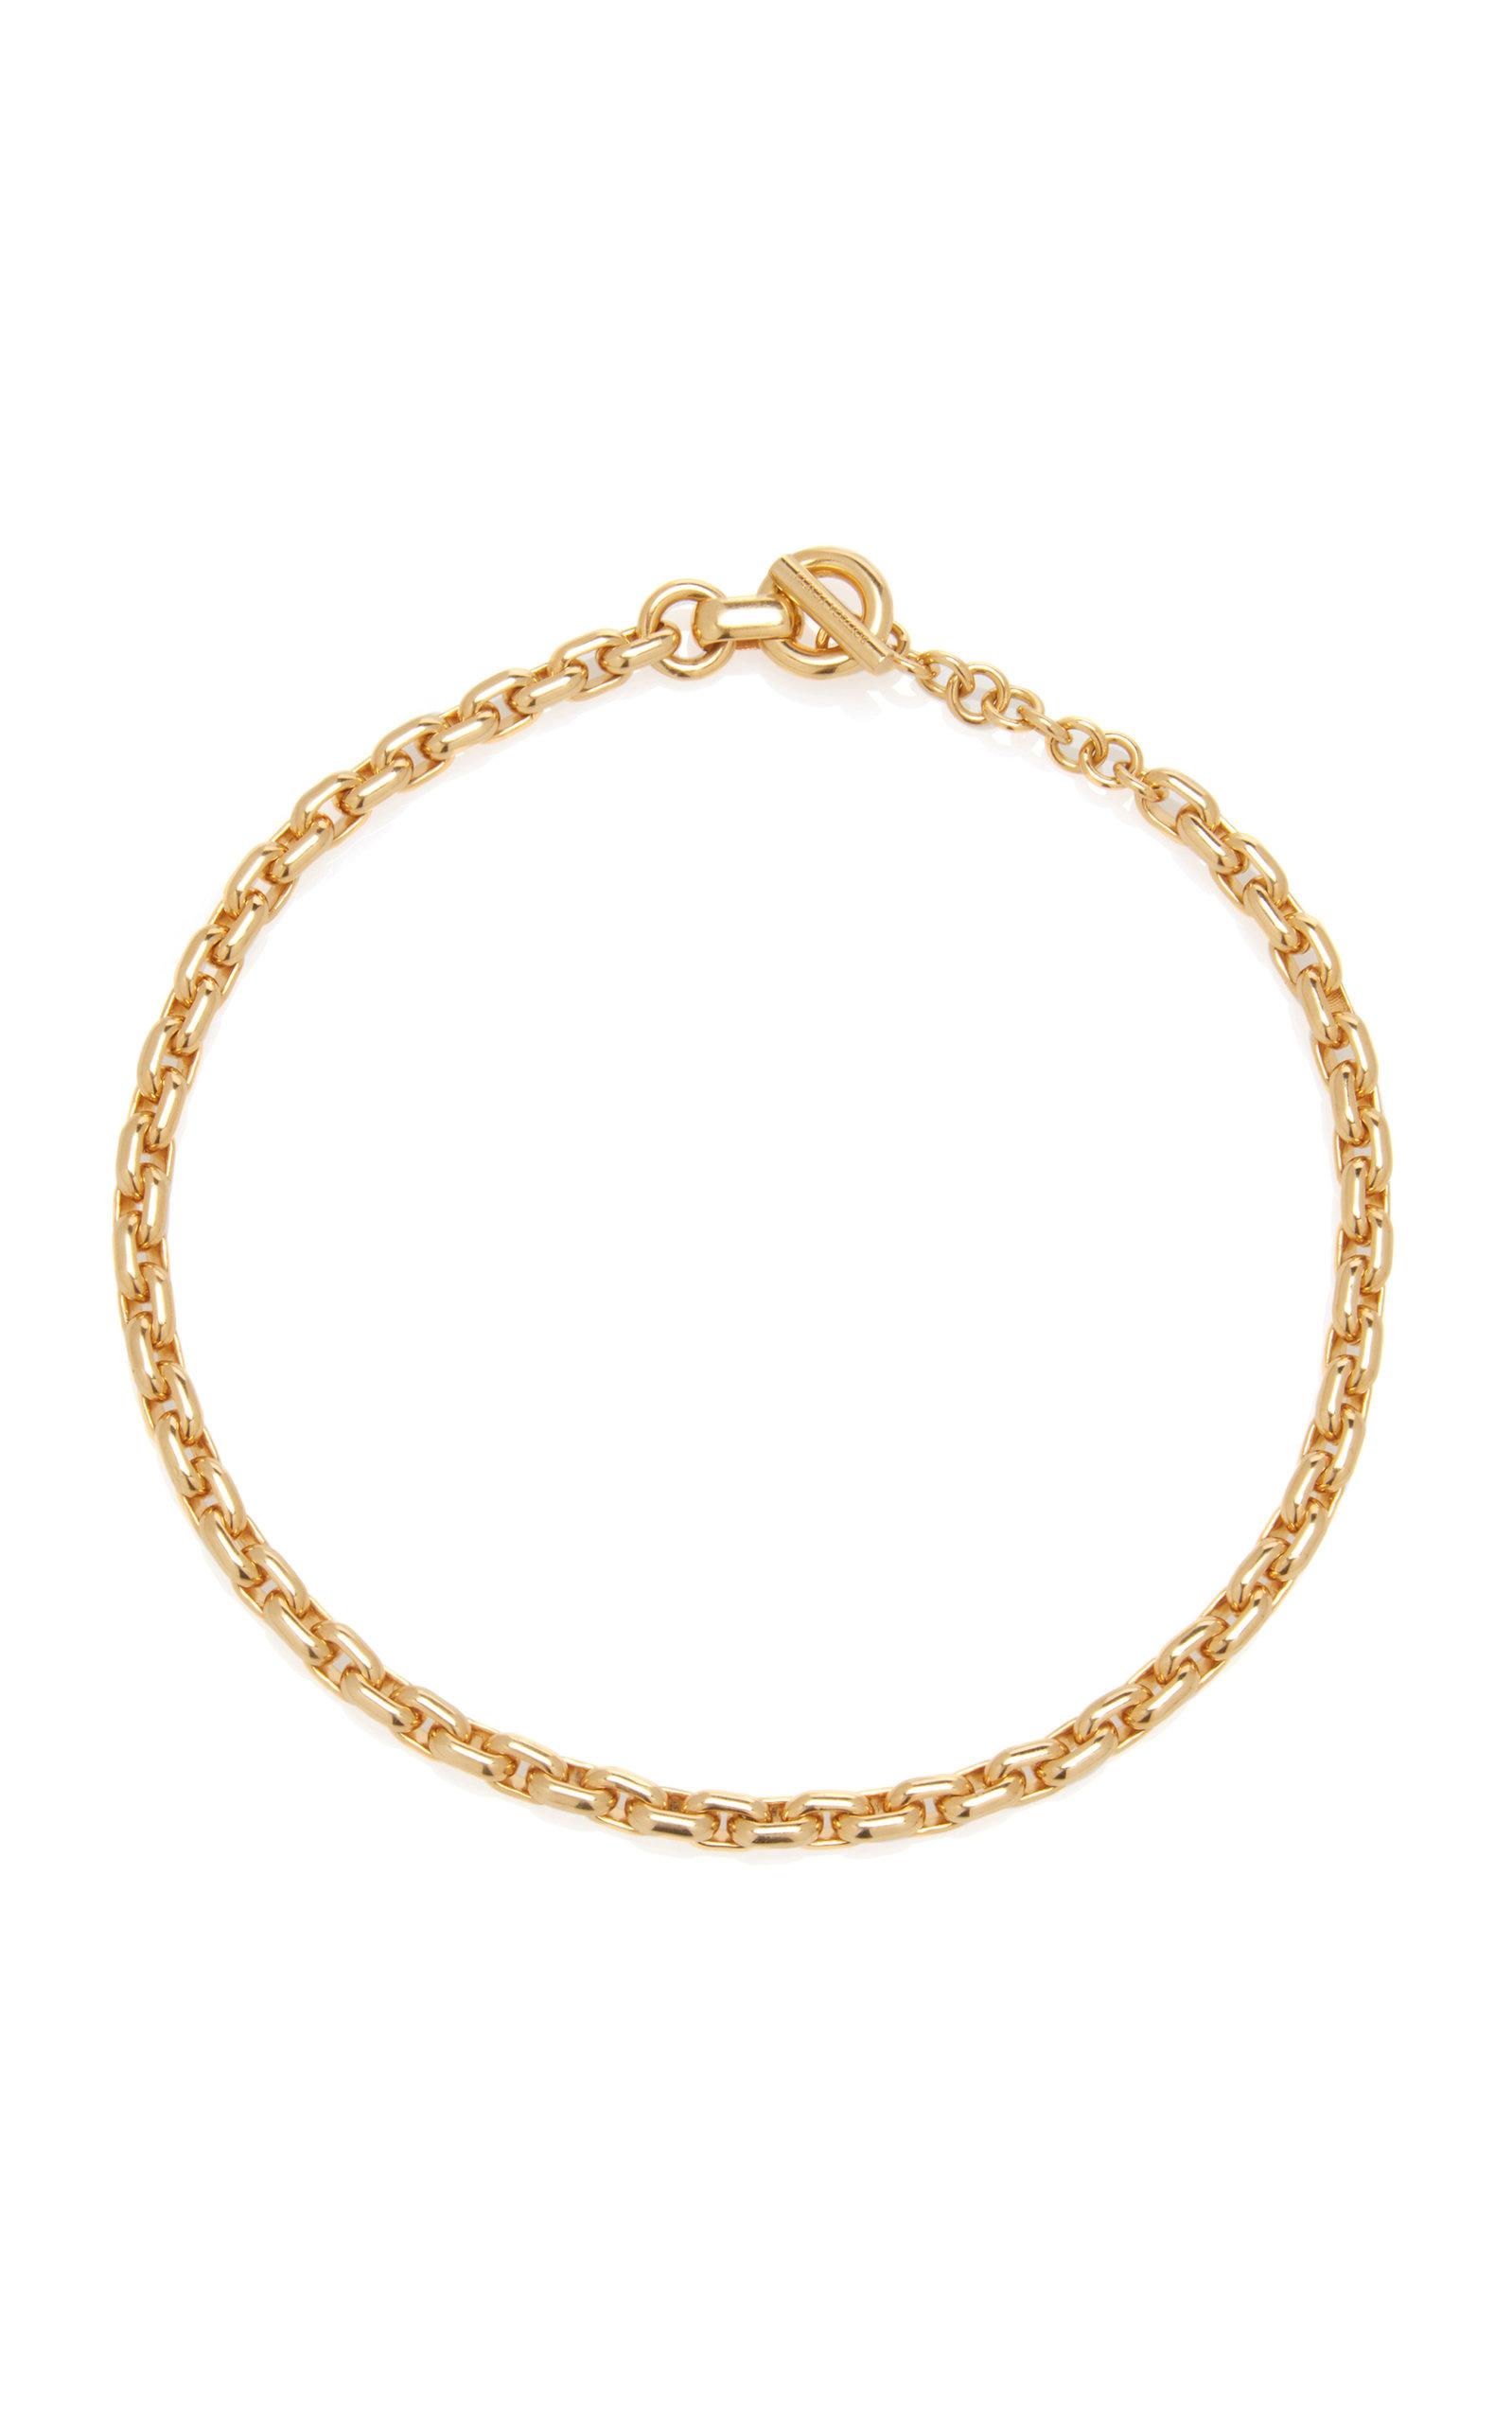 Bottega Veneta – Women's Chain Gold-Plated Collar Necklace – Gold – Moda Operandi